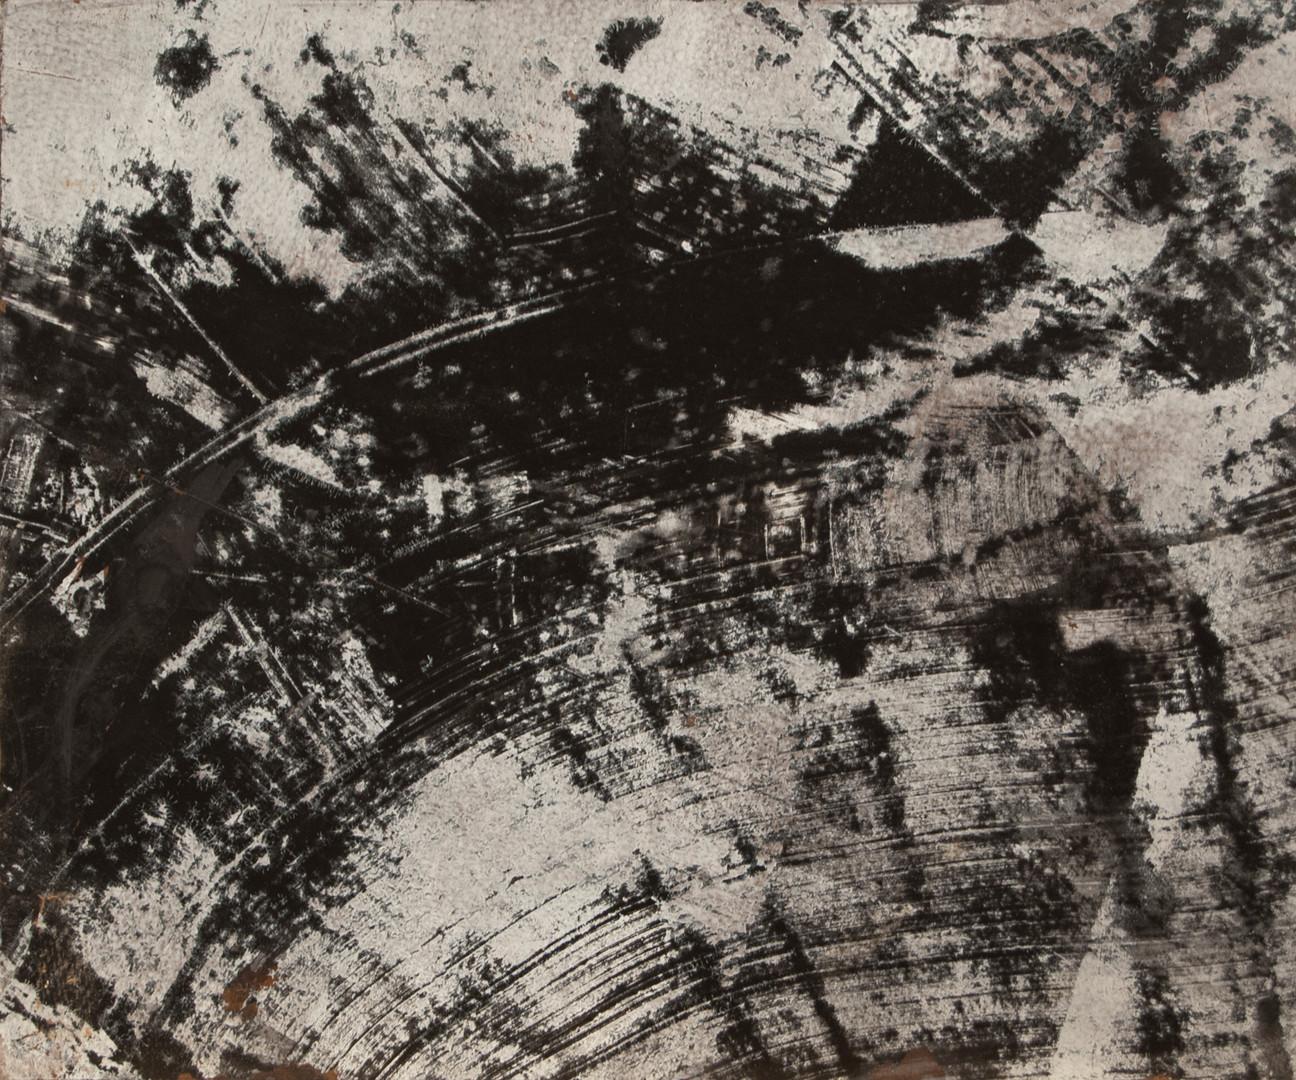 Black Snowflake, acrylic on panel, 12x10, 2016